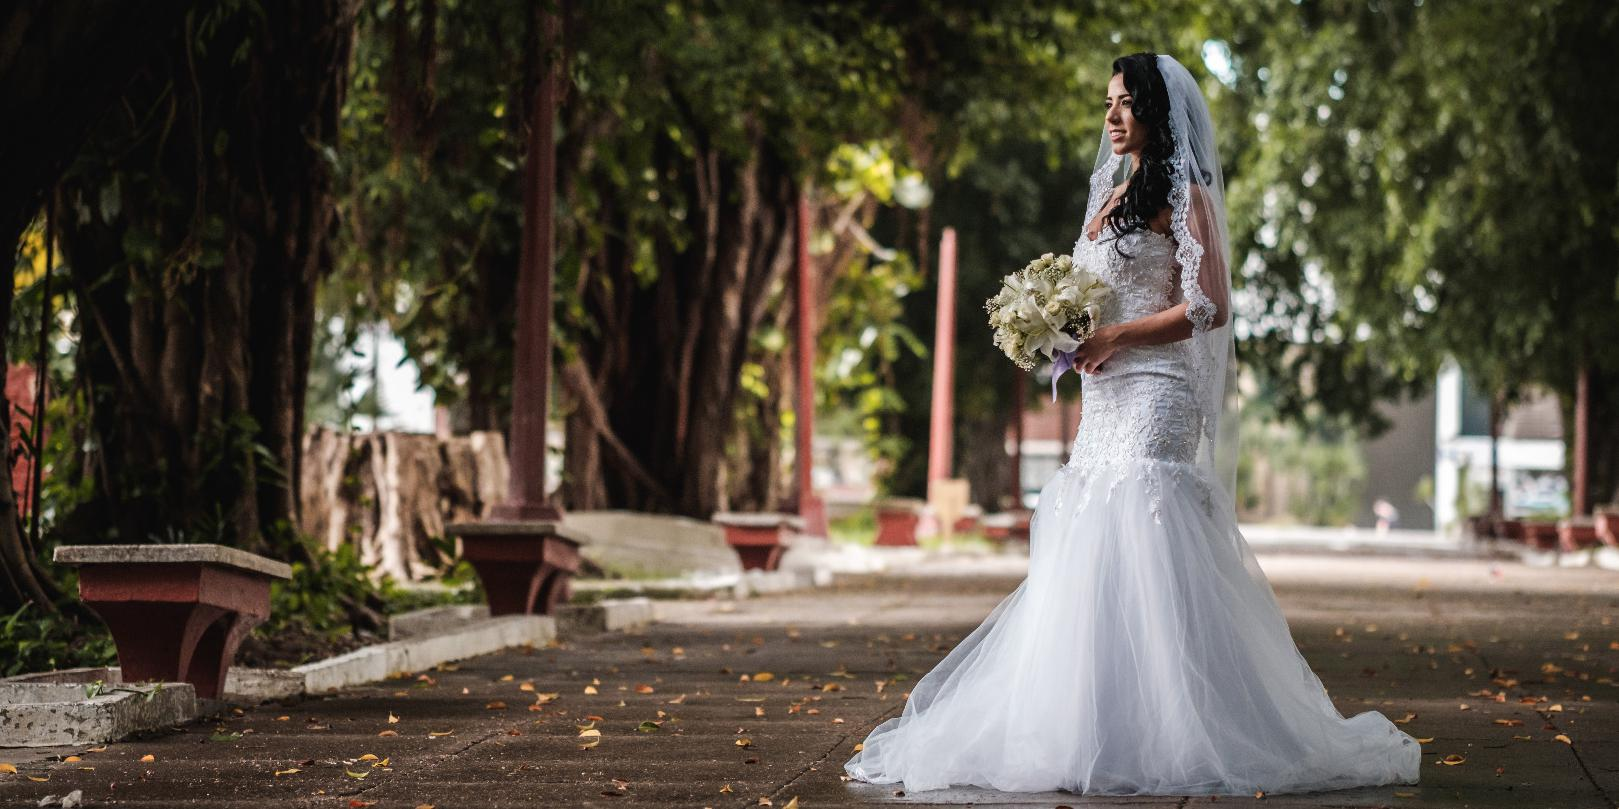 bodas-sin-clasificar-sin-tema-cuba-35411.jpg